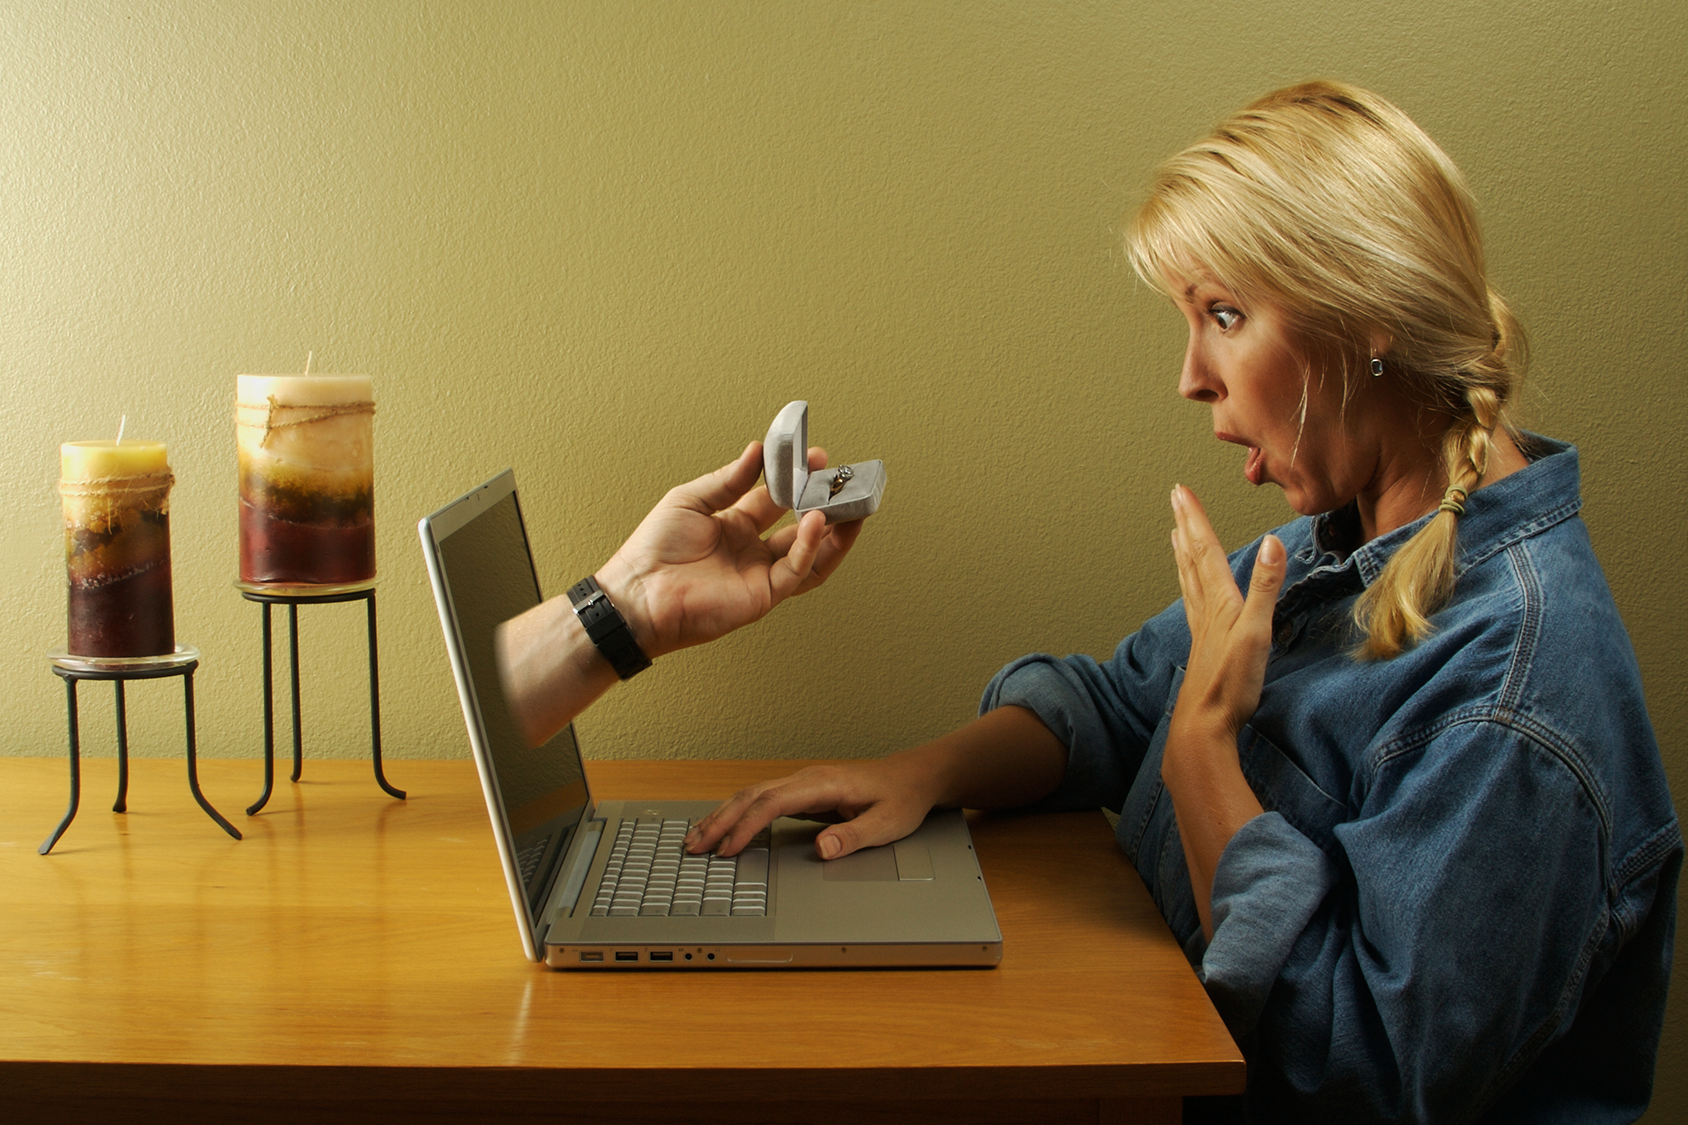 знакомство с олигархом в интернете